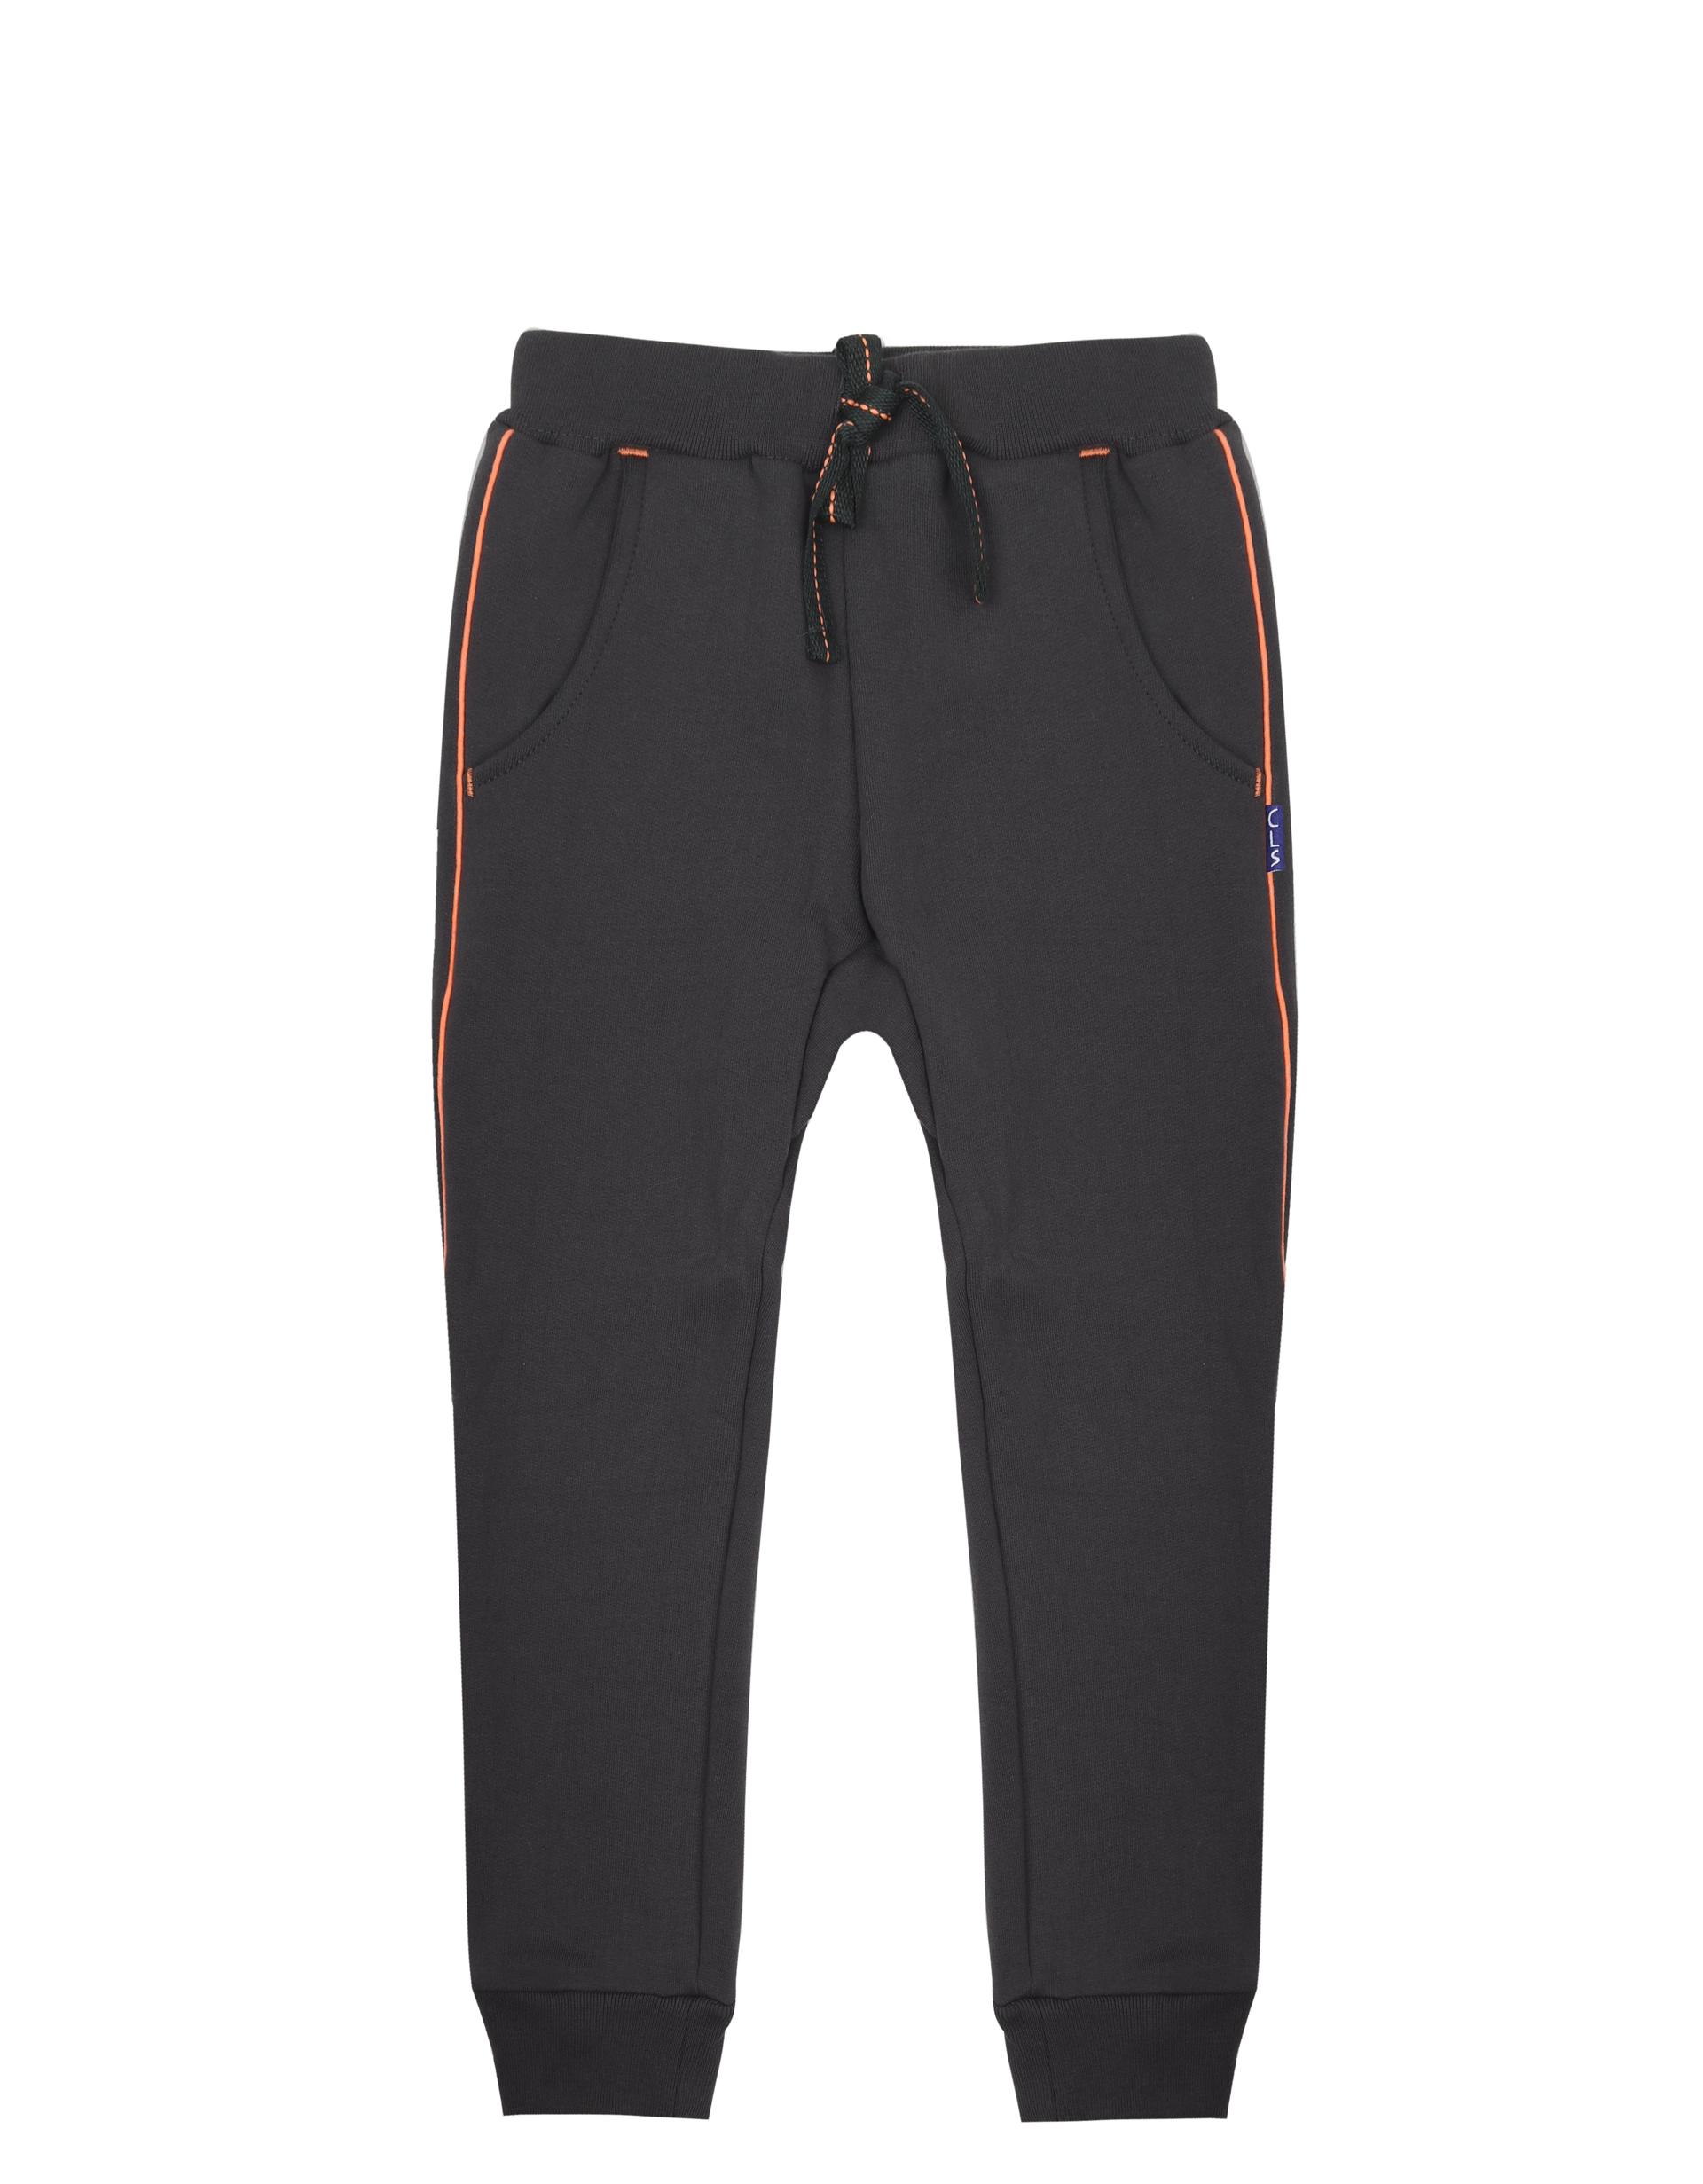 2015004-Pants-Dark-Grey